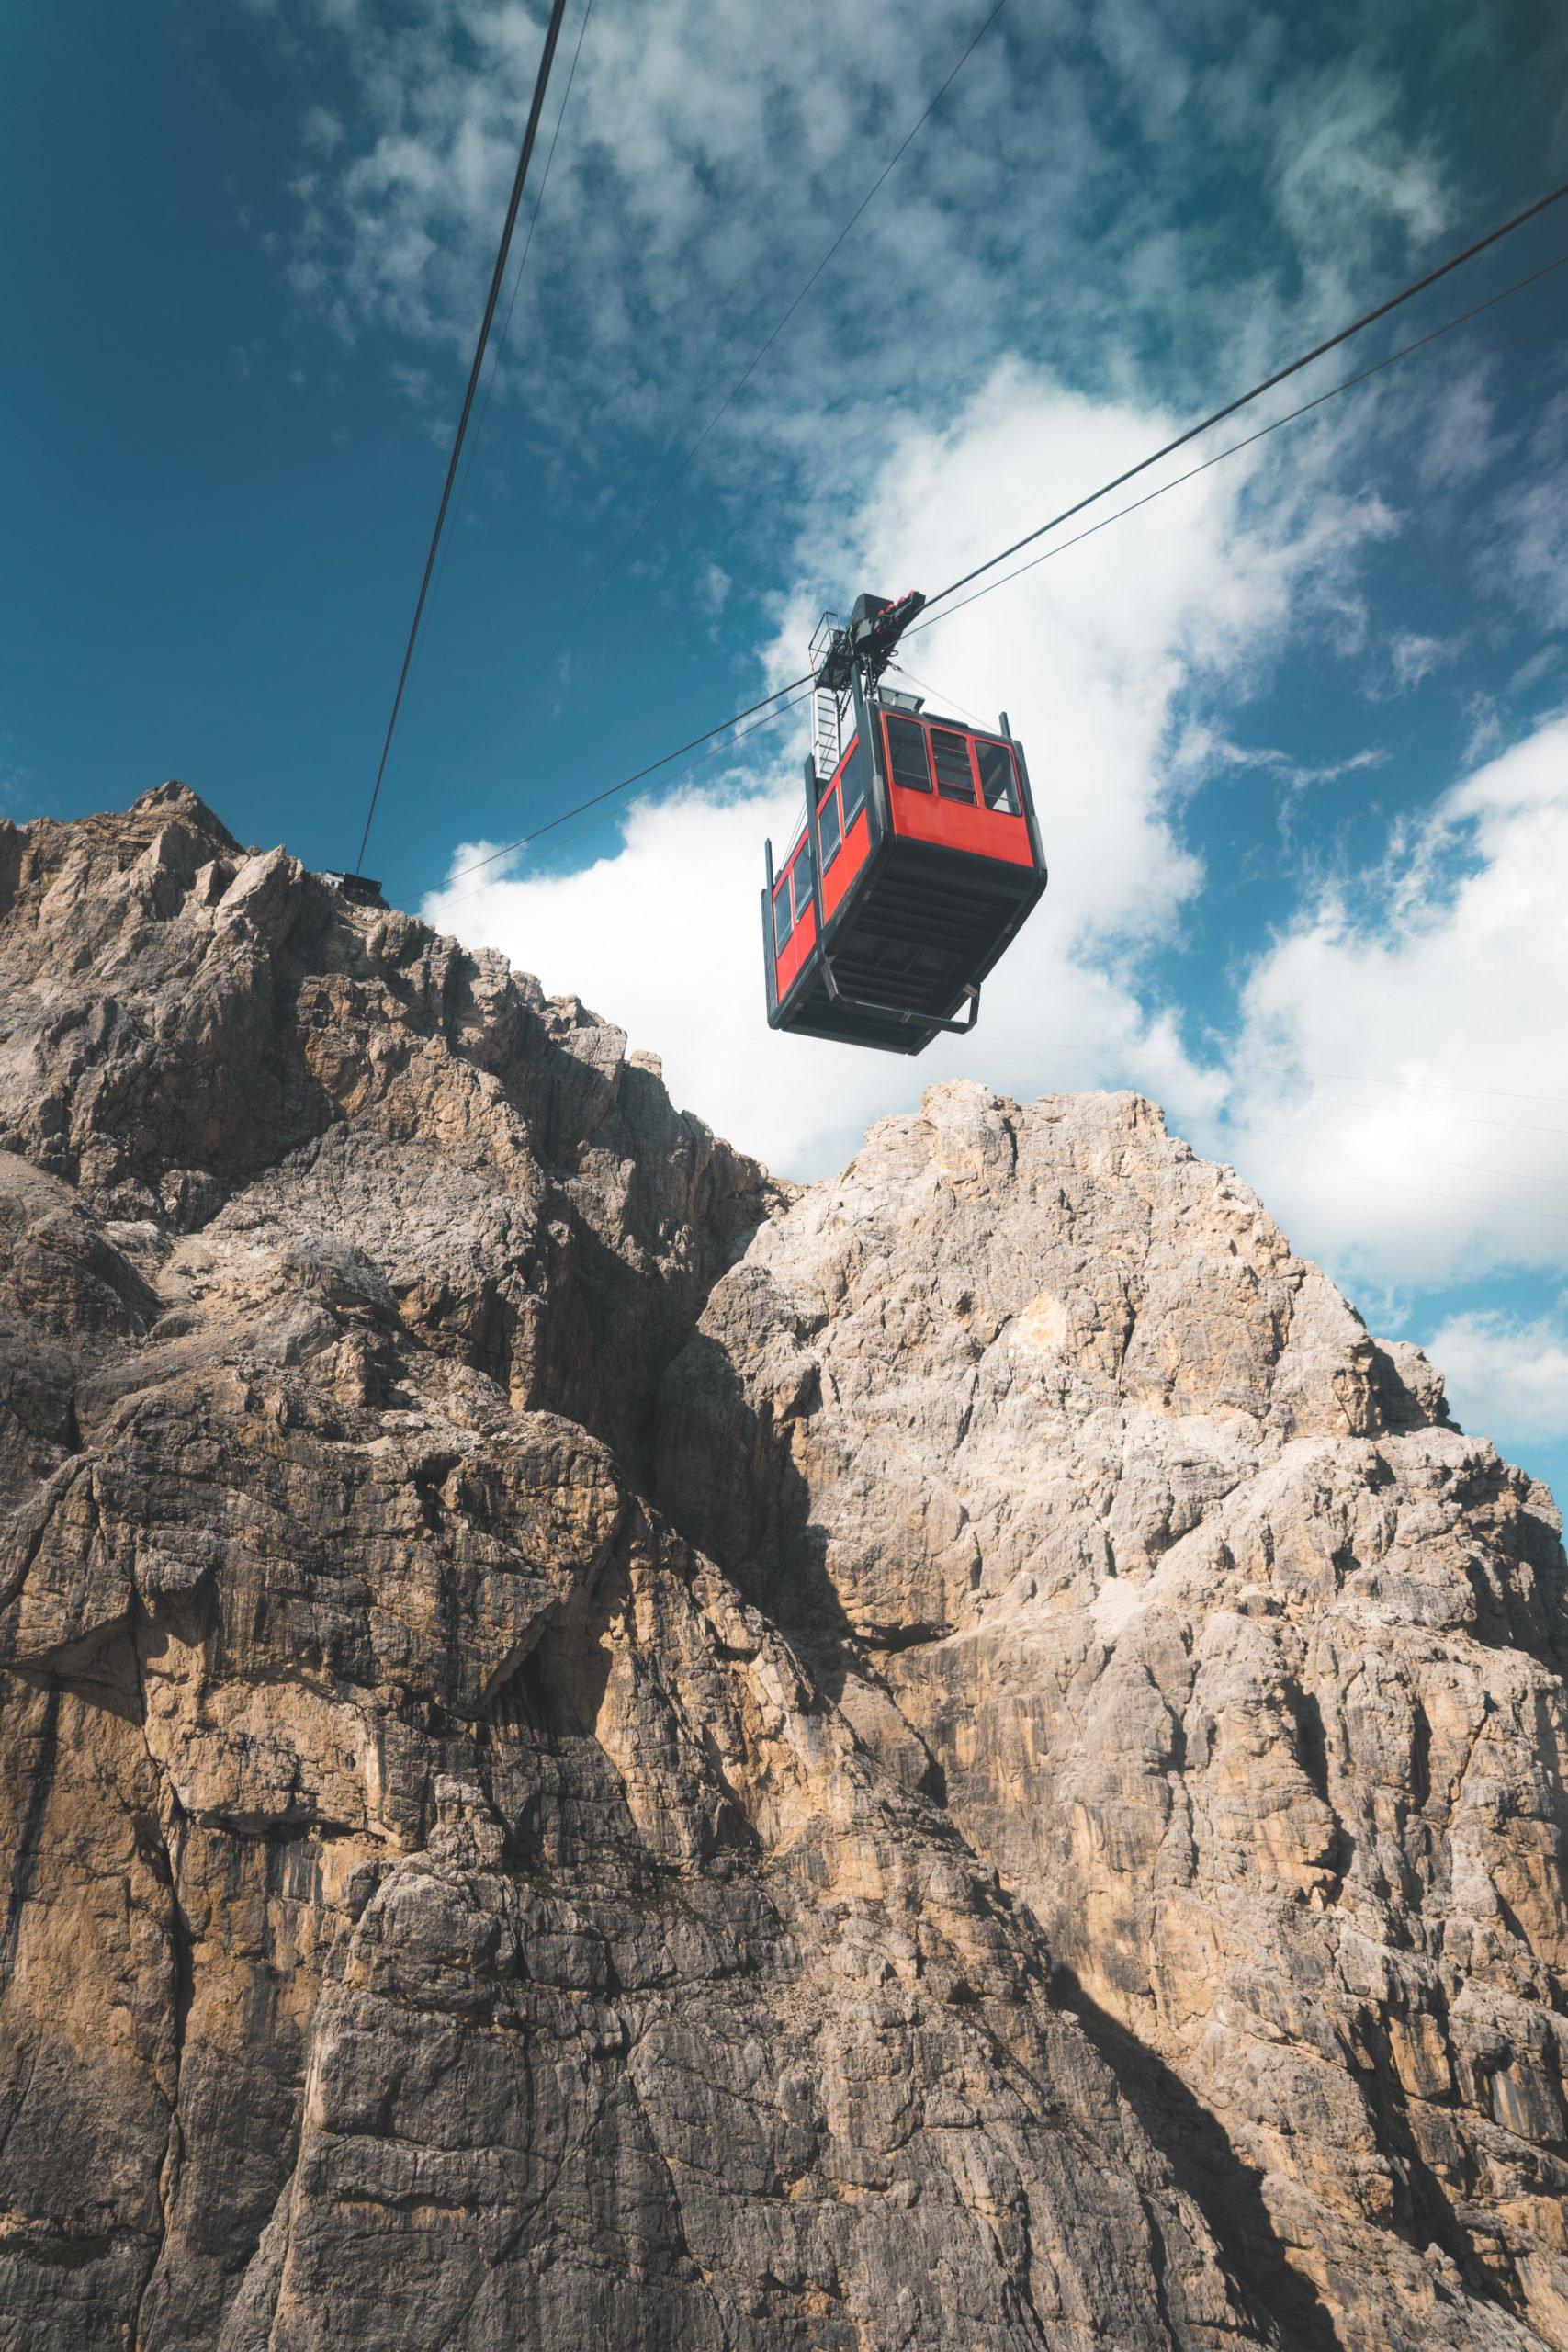 Summer 2020 UNESCO Dolomites Cortina d'Ampezzo